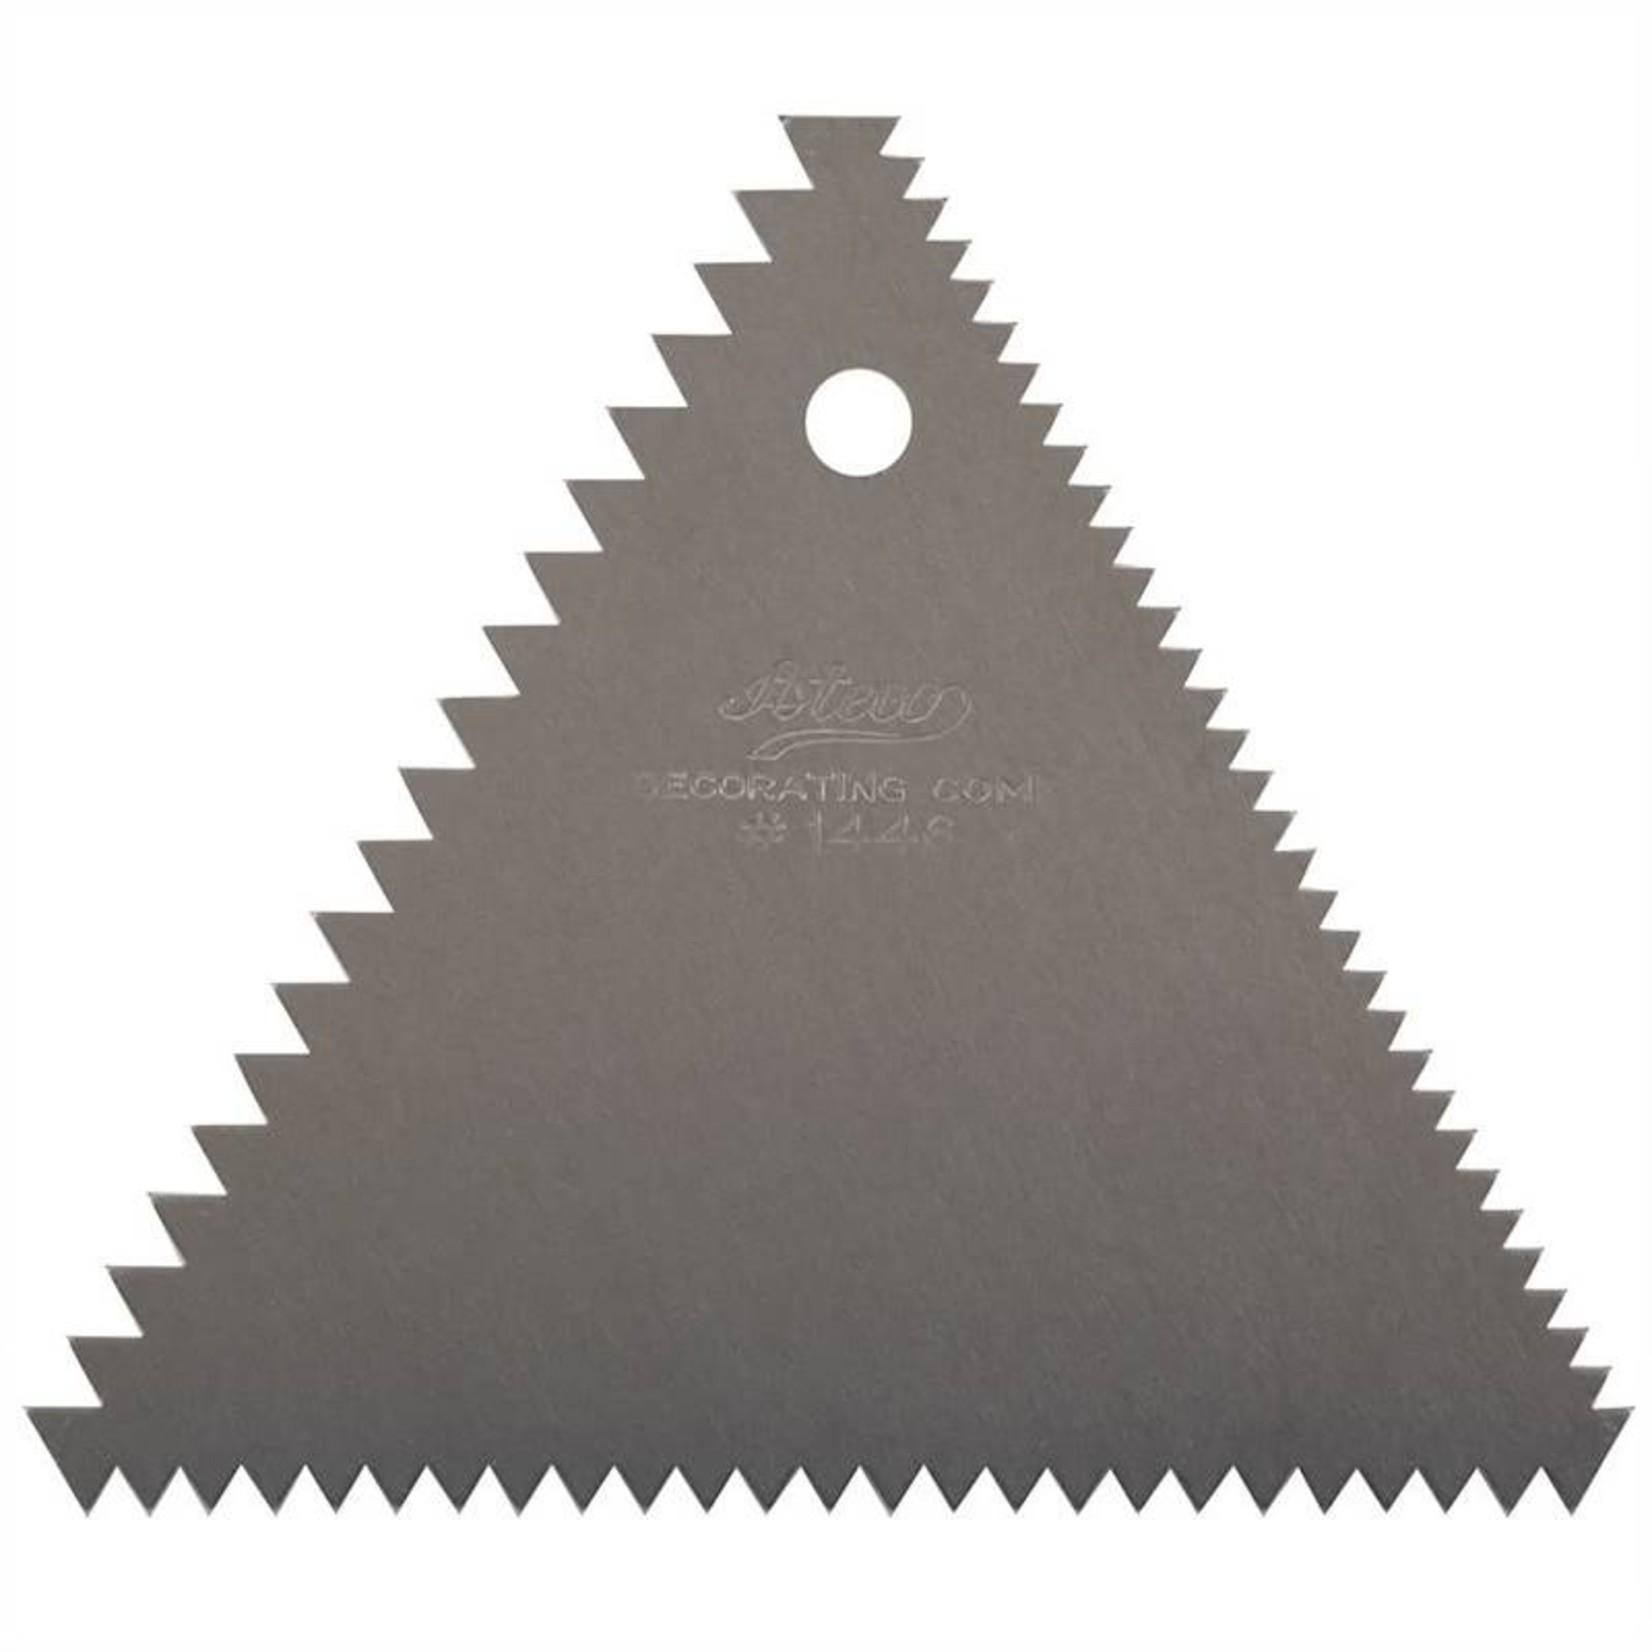 Ateco Ateco - Triangle Decorating Comb, 1446